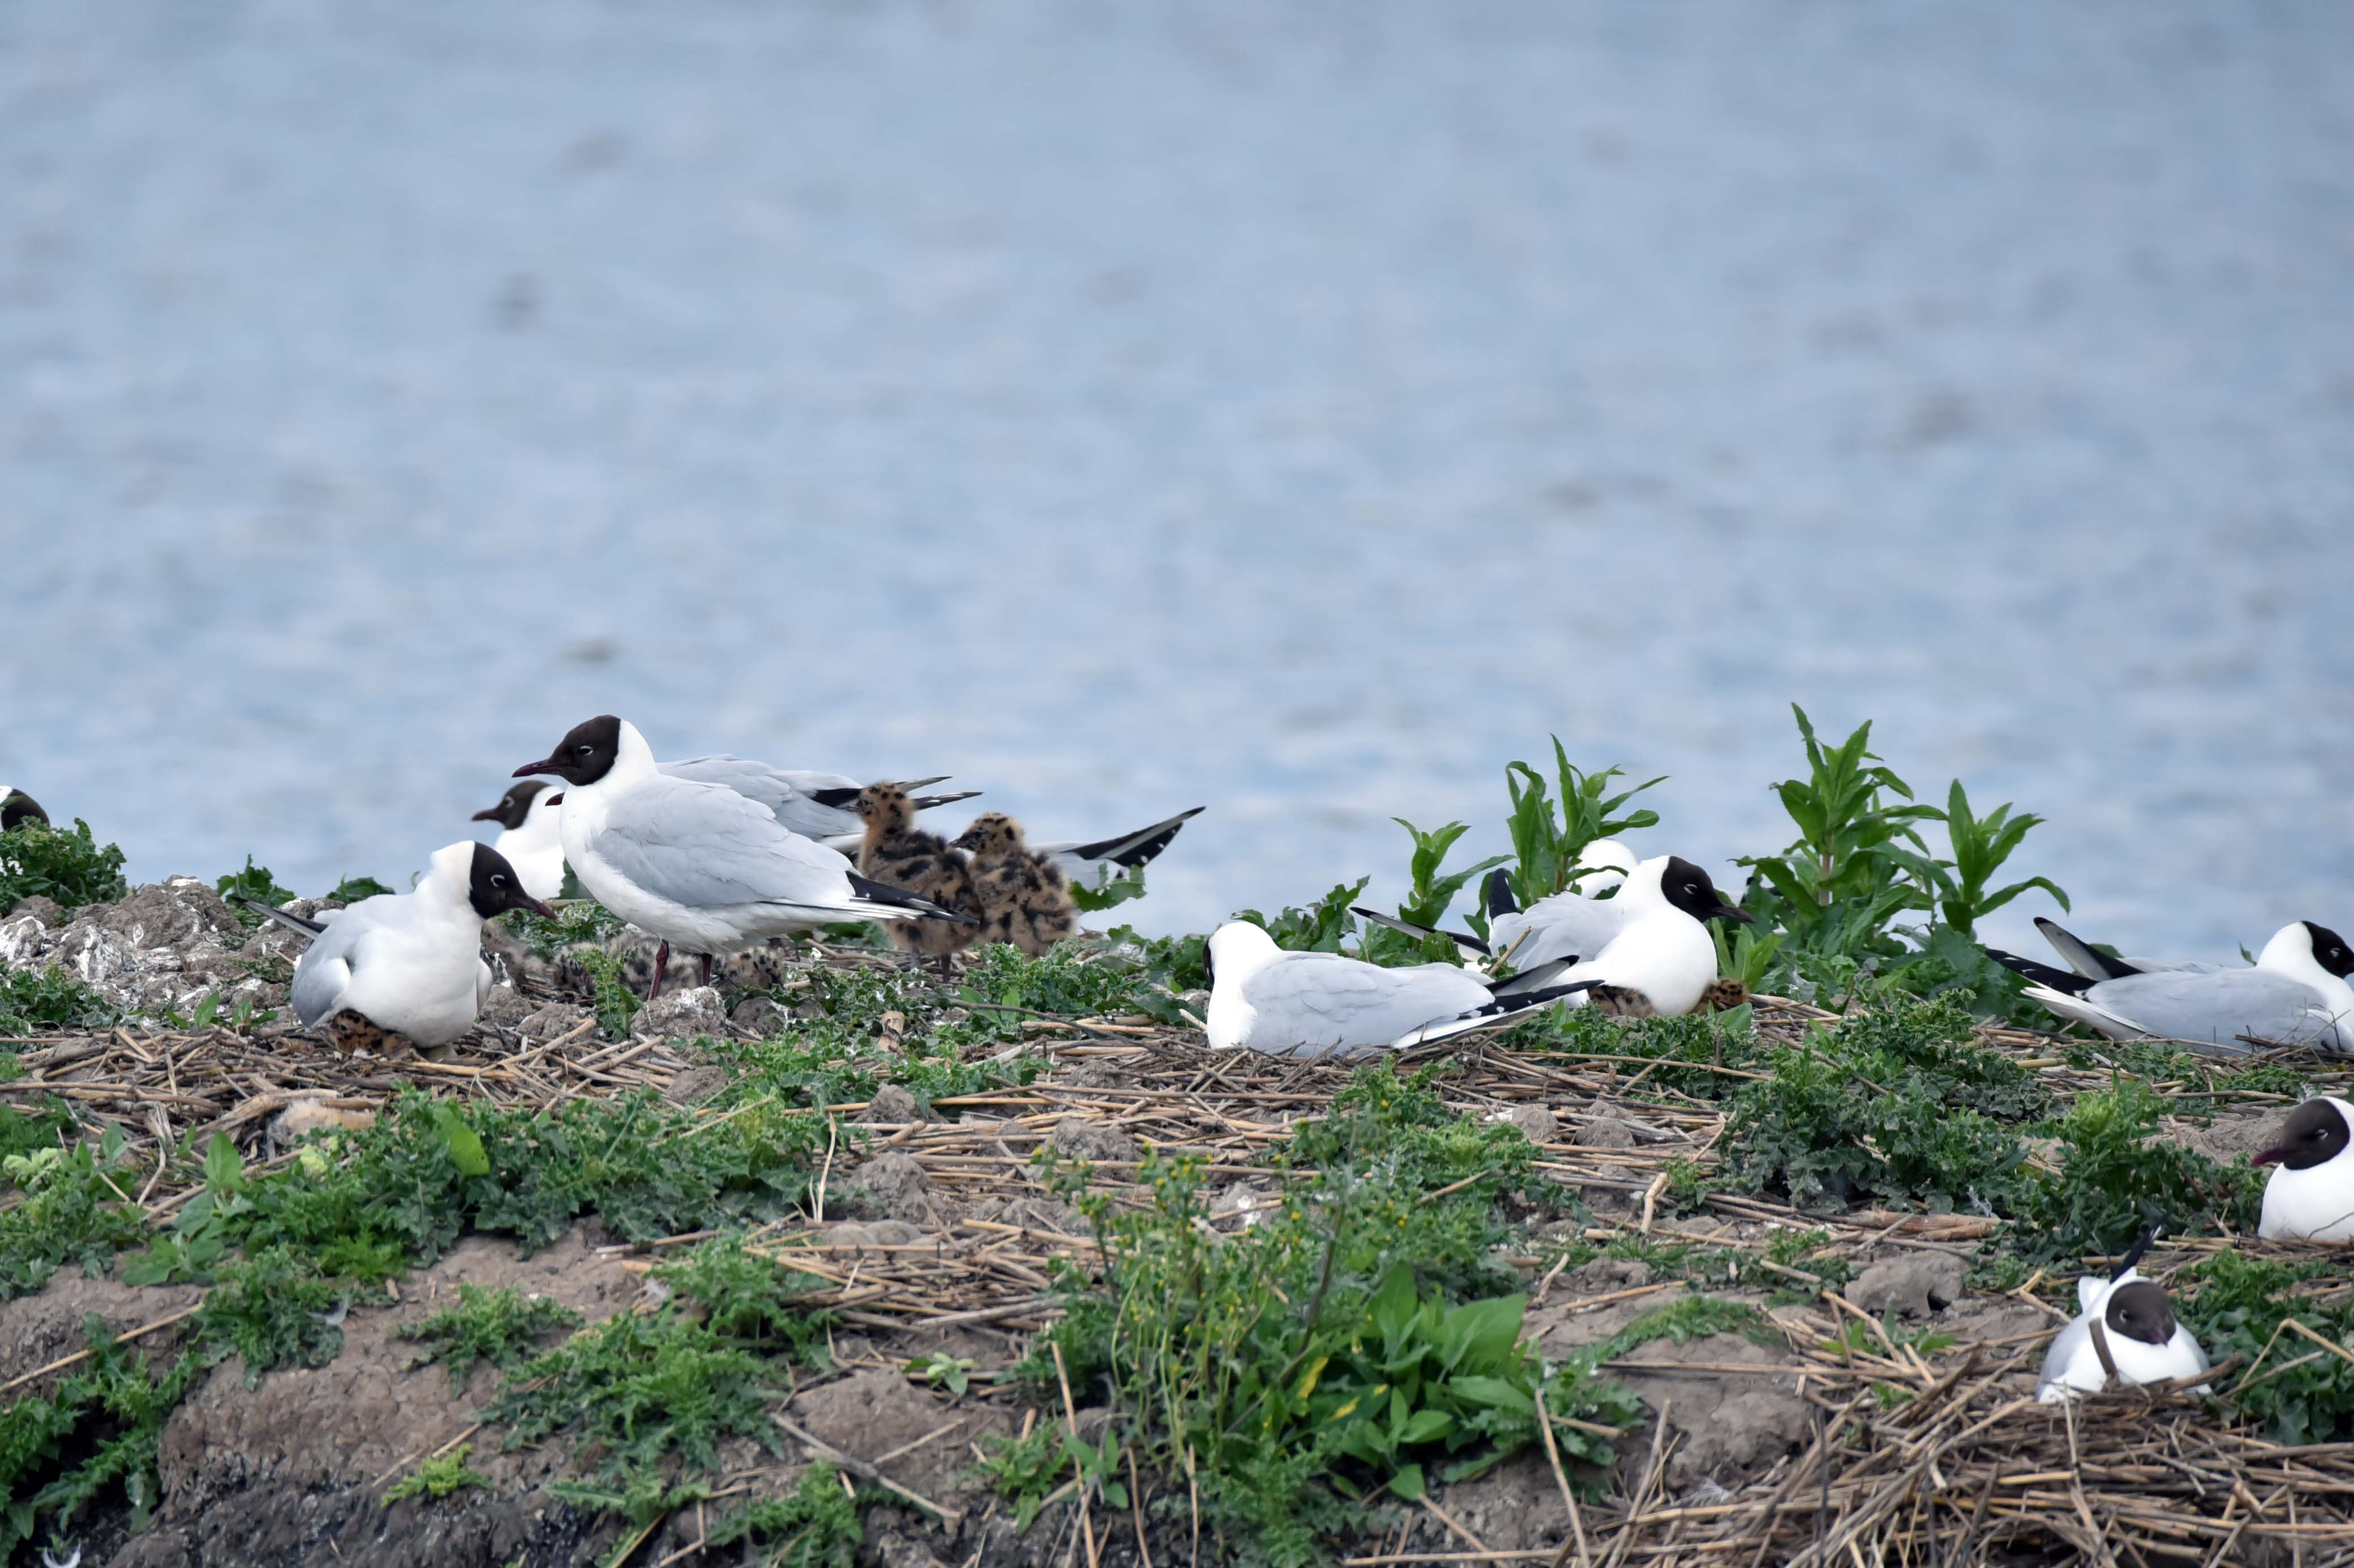 Black Headed Gulls